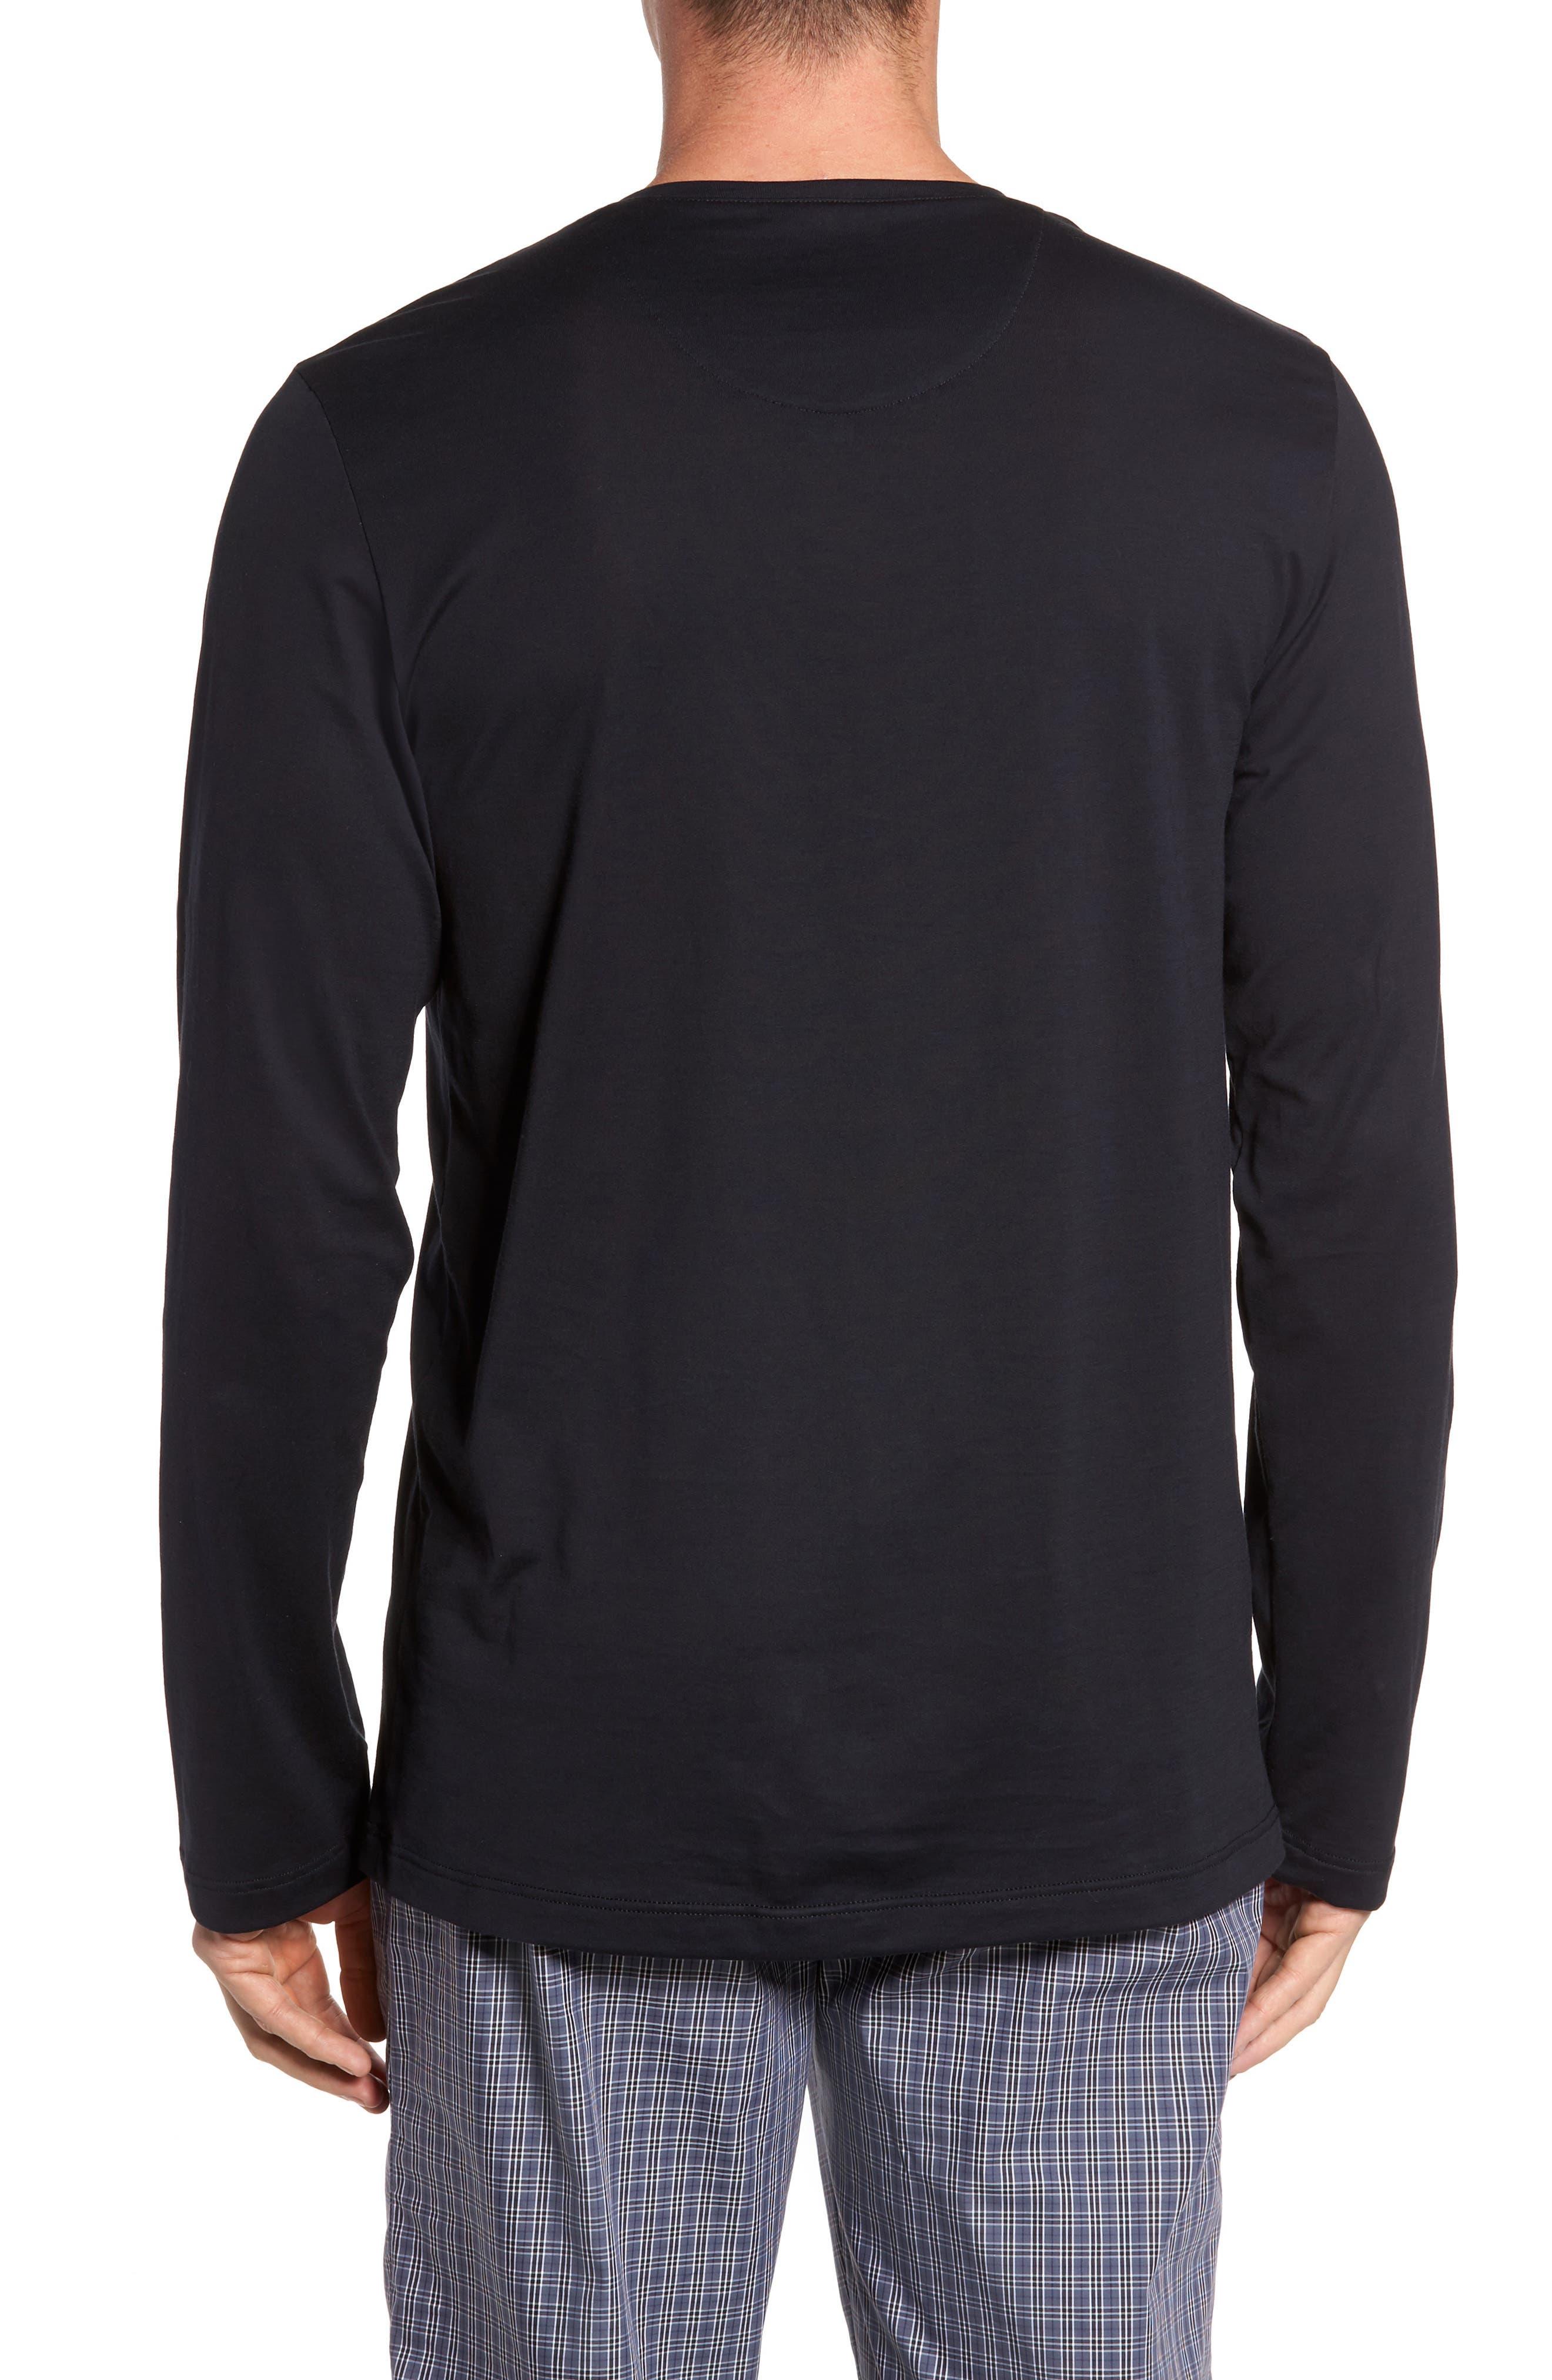 Night & Day Lounge T-Shirt,                             Alternate thumbnail 2, color,                             BLACK